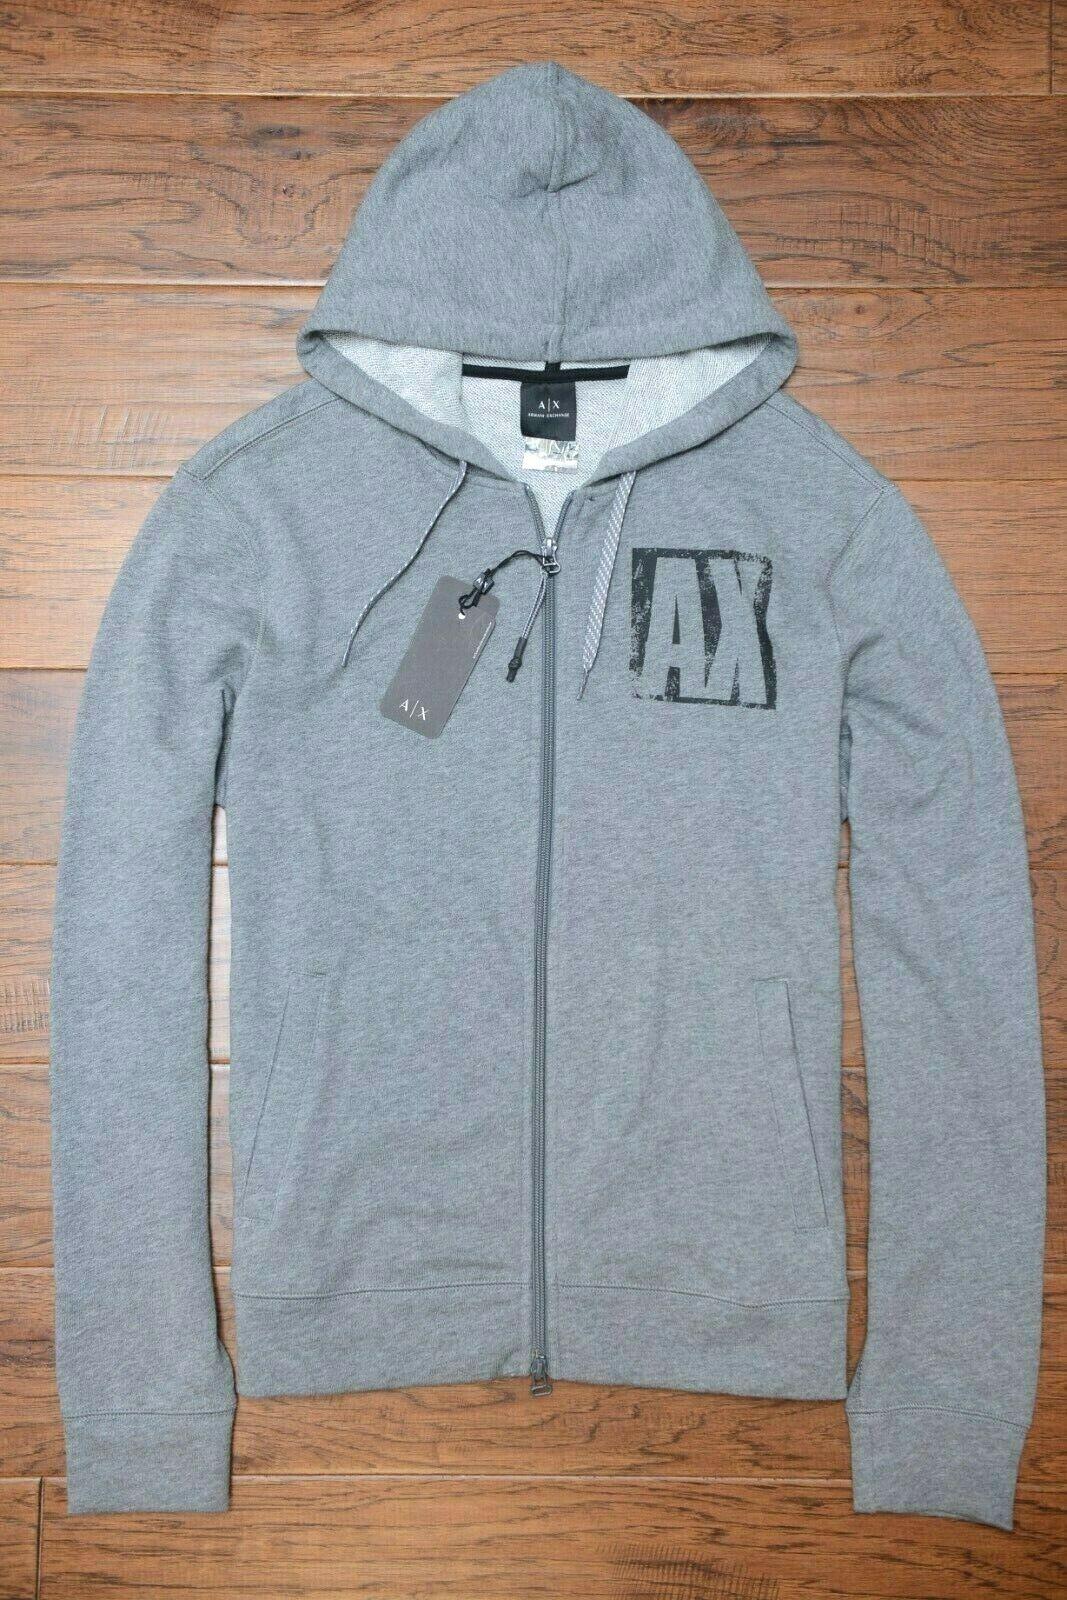 Armani Exchange A X Men's Full Zip Light Gray Cotton Hooded Jacket Hoodie S